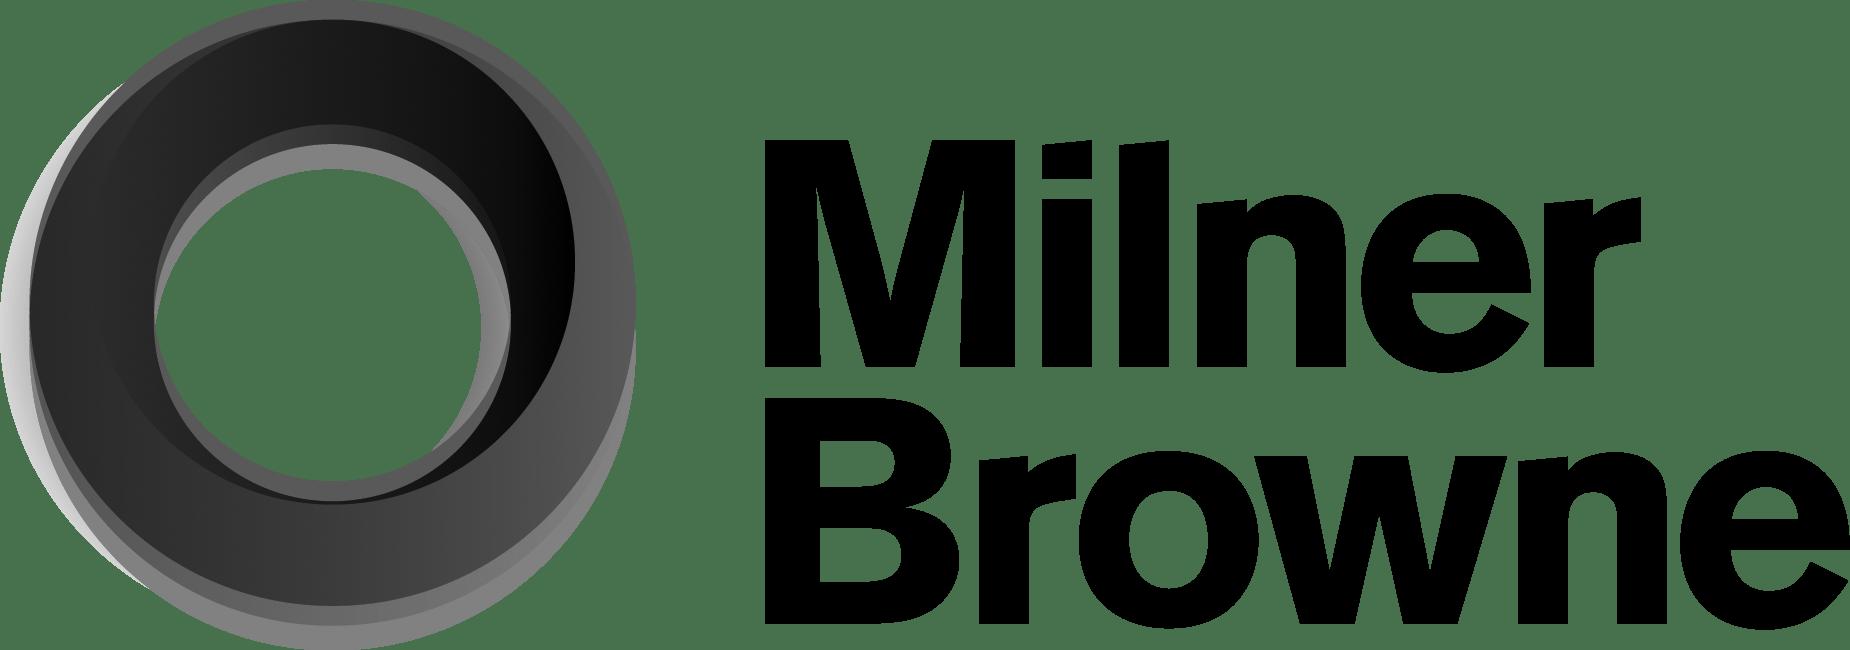 Milner Browne